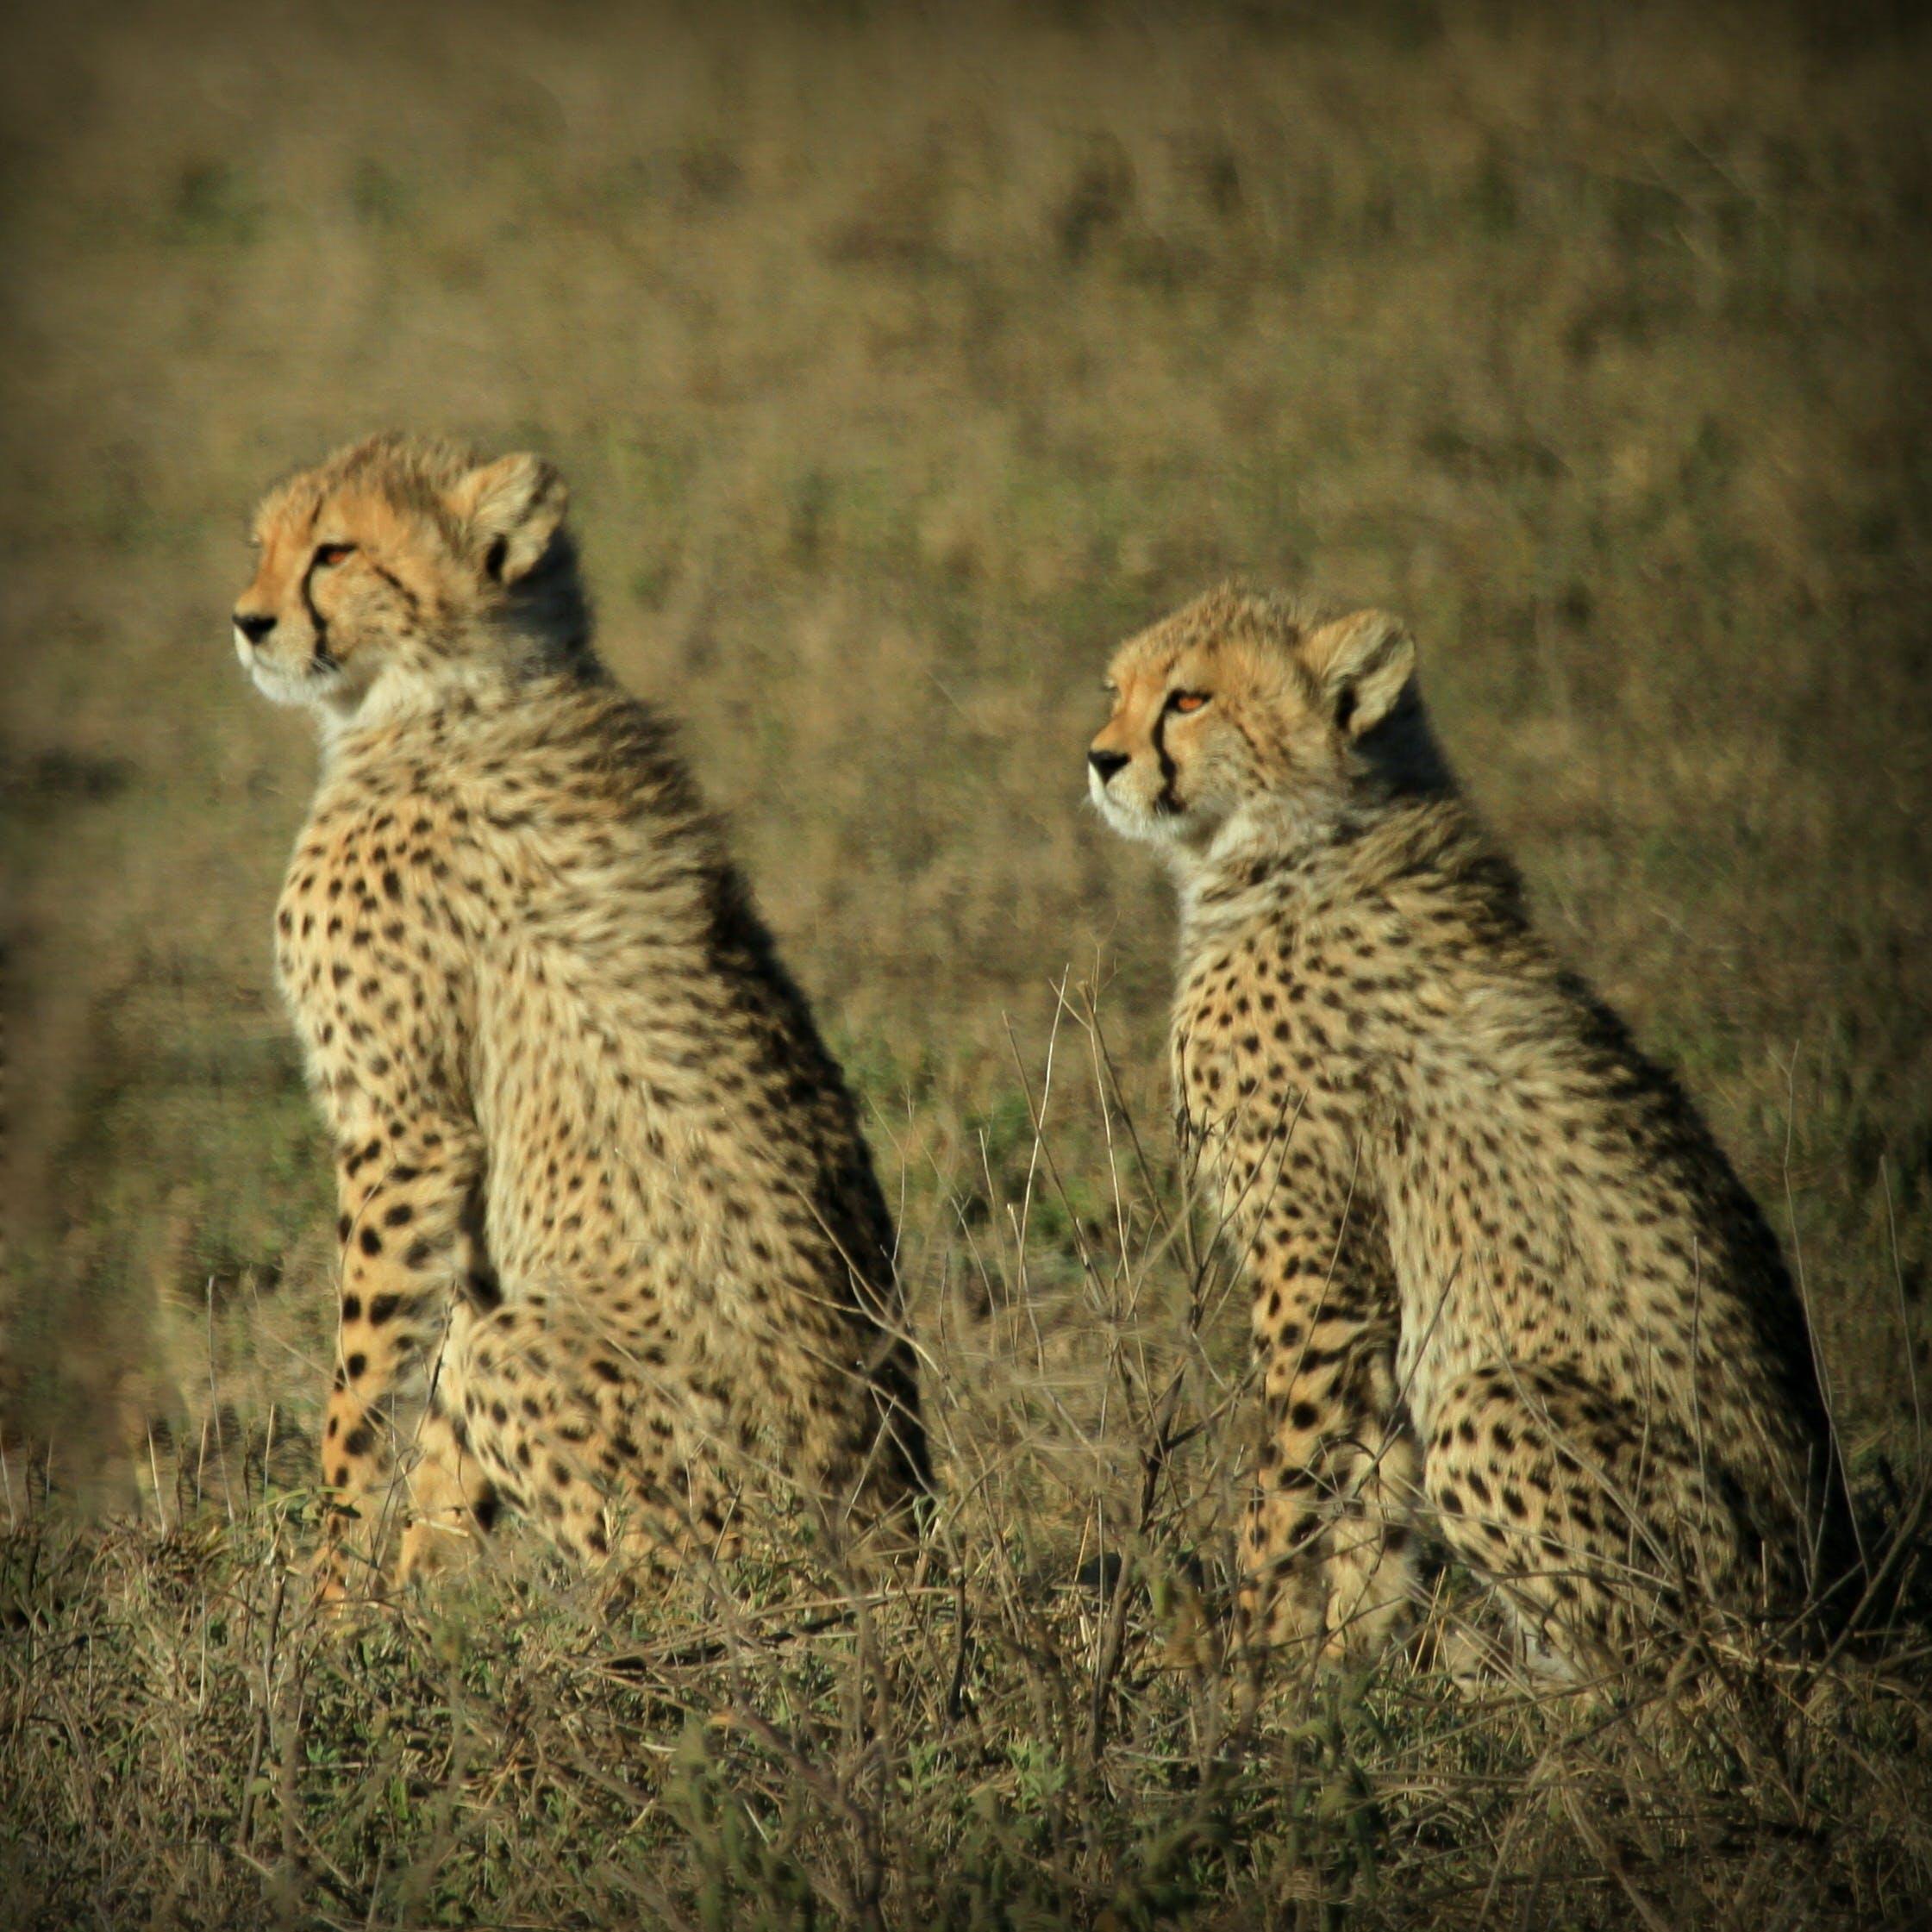 Kostenloses Stock Foto zu gepard, gepardjagd, junger gepard, masaai mara